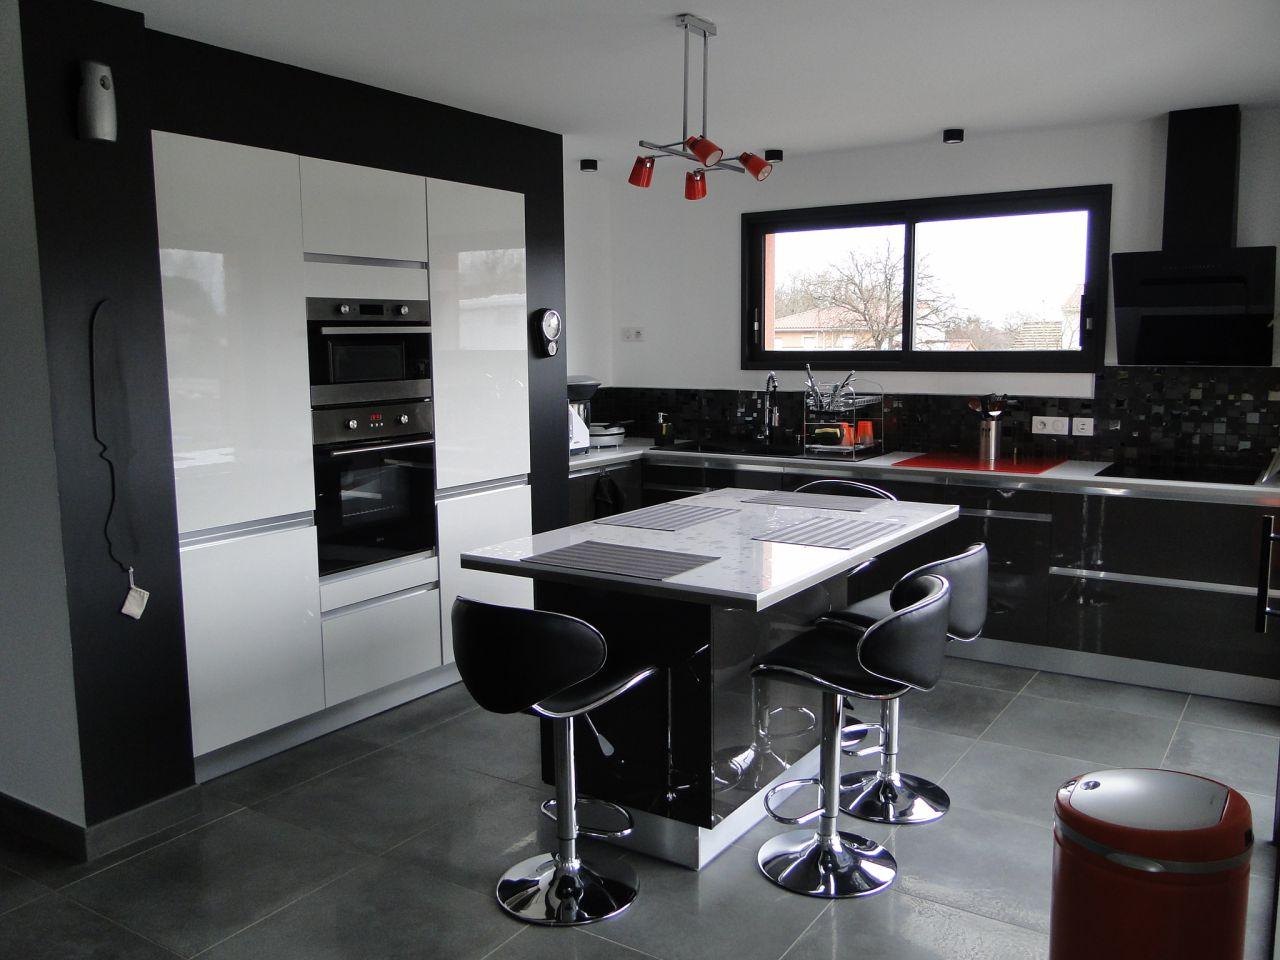 cuisine conforama 136 messages page 4. Black Bedroom Furniture Sets. Home Design Ideas